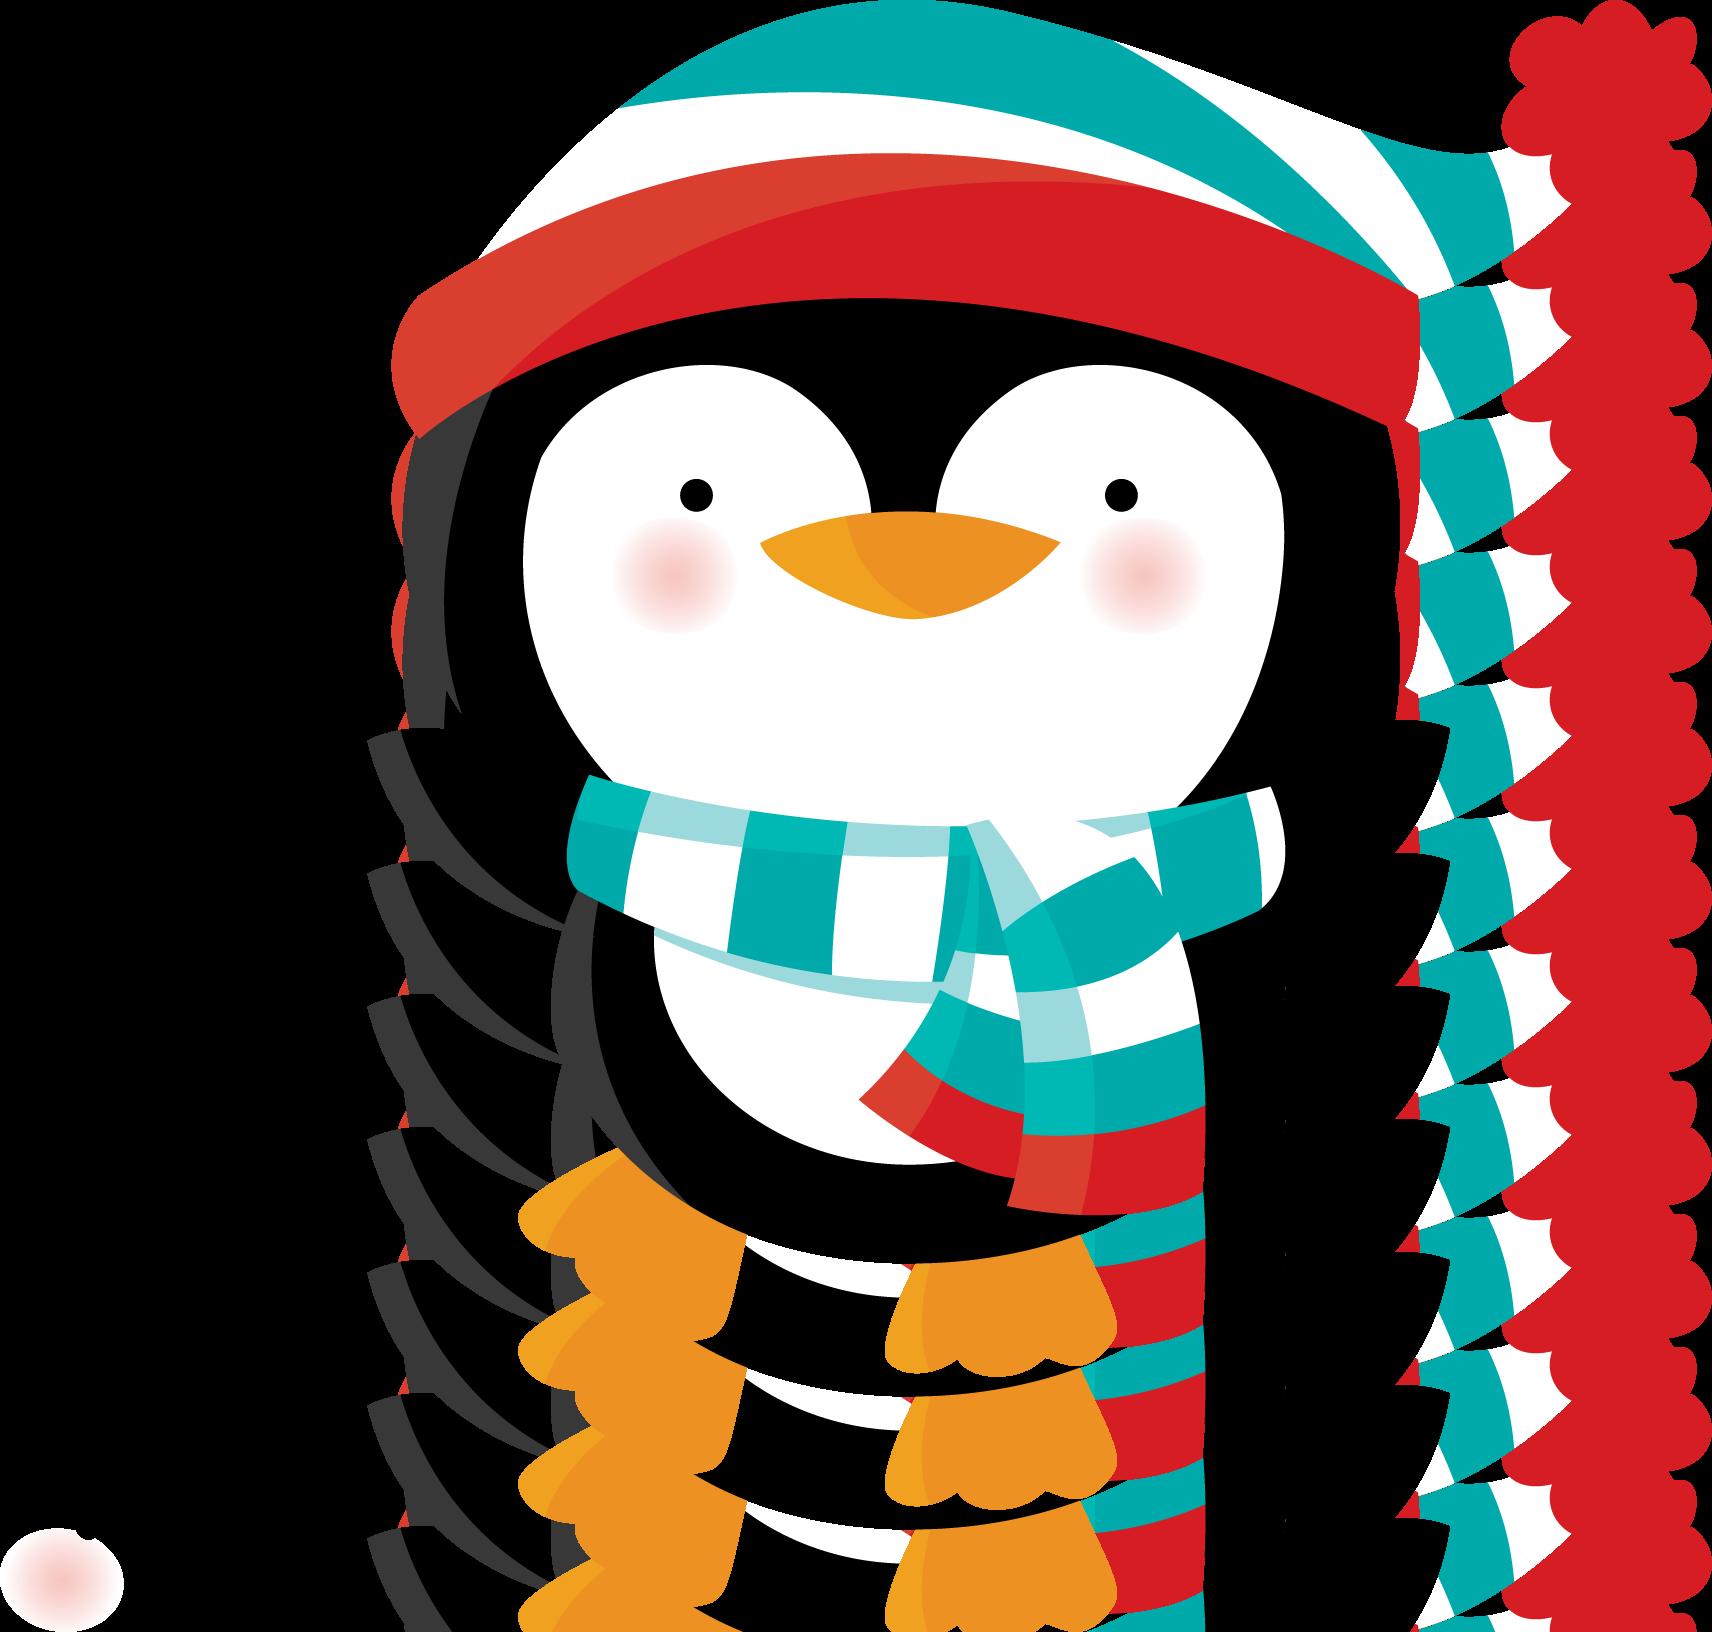 banner free library January clipart female penguin. Photo by daniellemoraesfalcao minus.